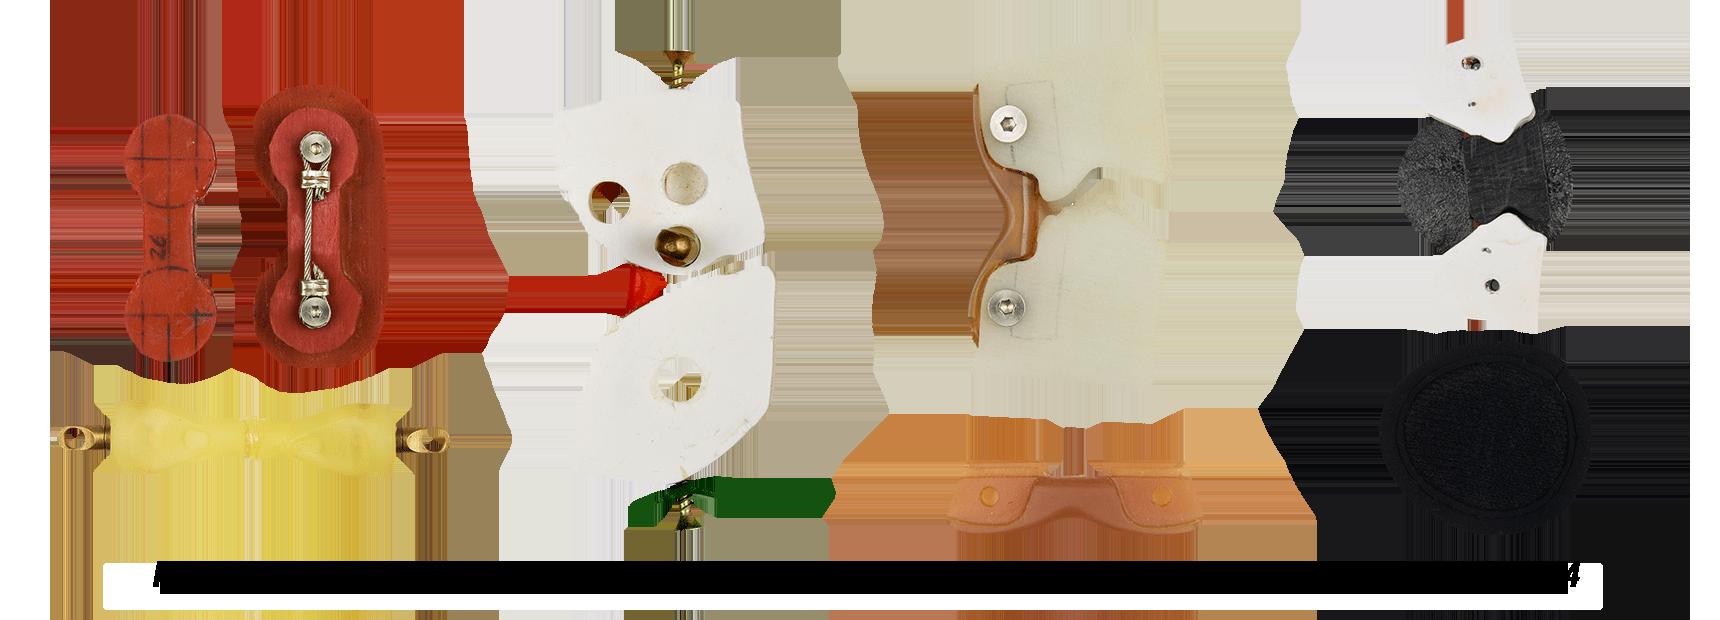 POD Active Knee Braces - Early Hinge Prototypes